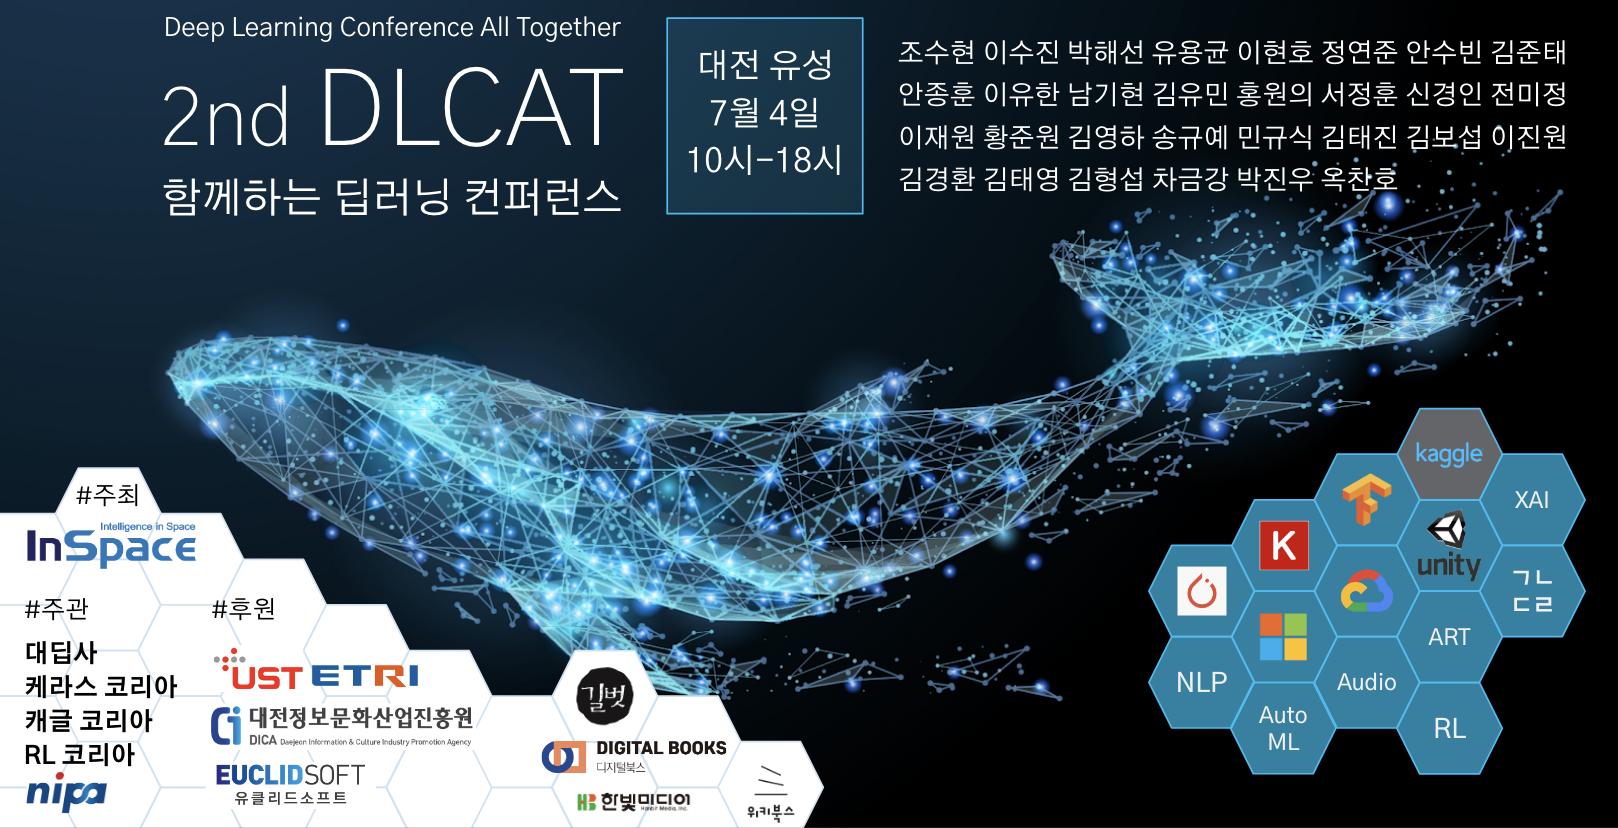 DLCAT#2 참석 후기 & 정리